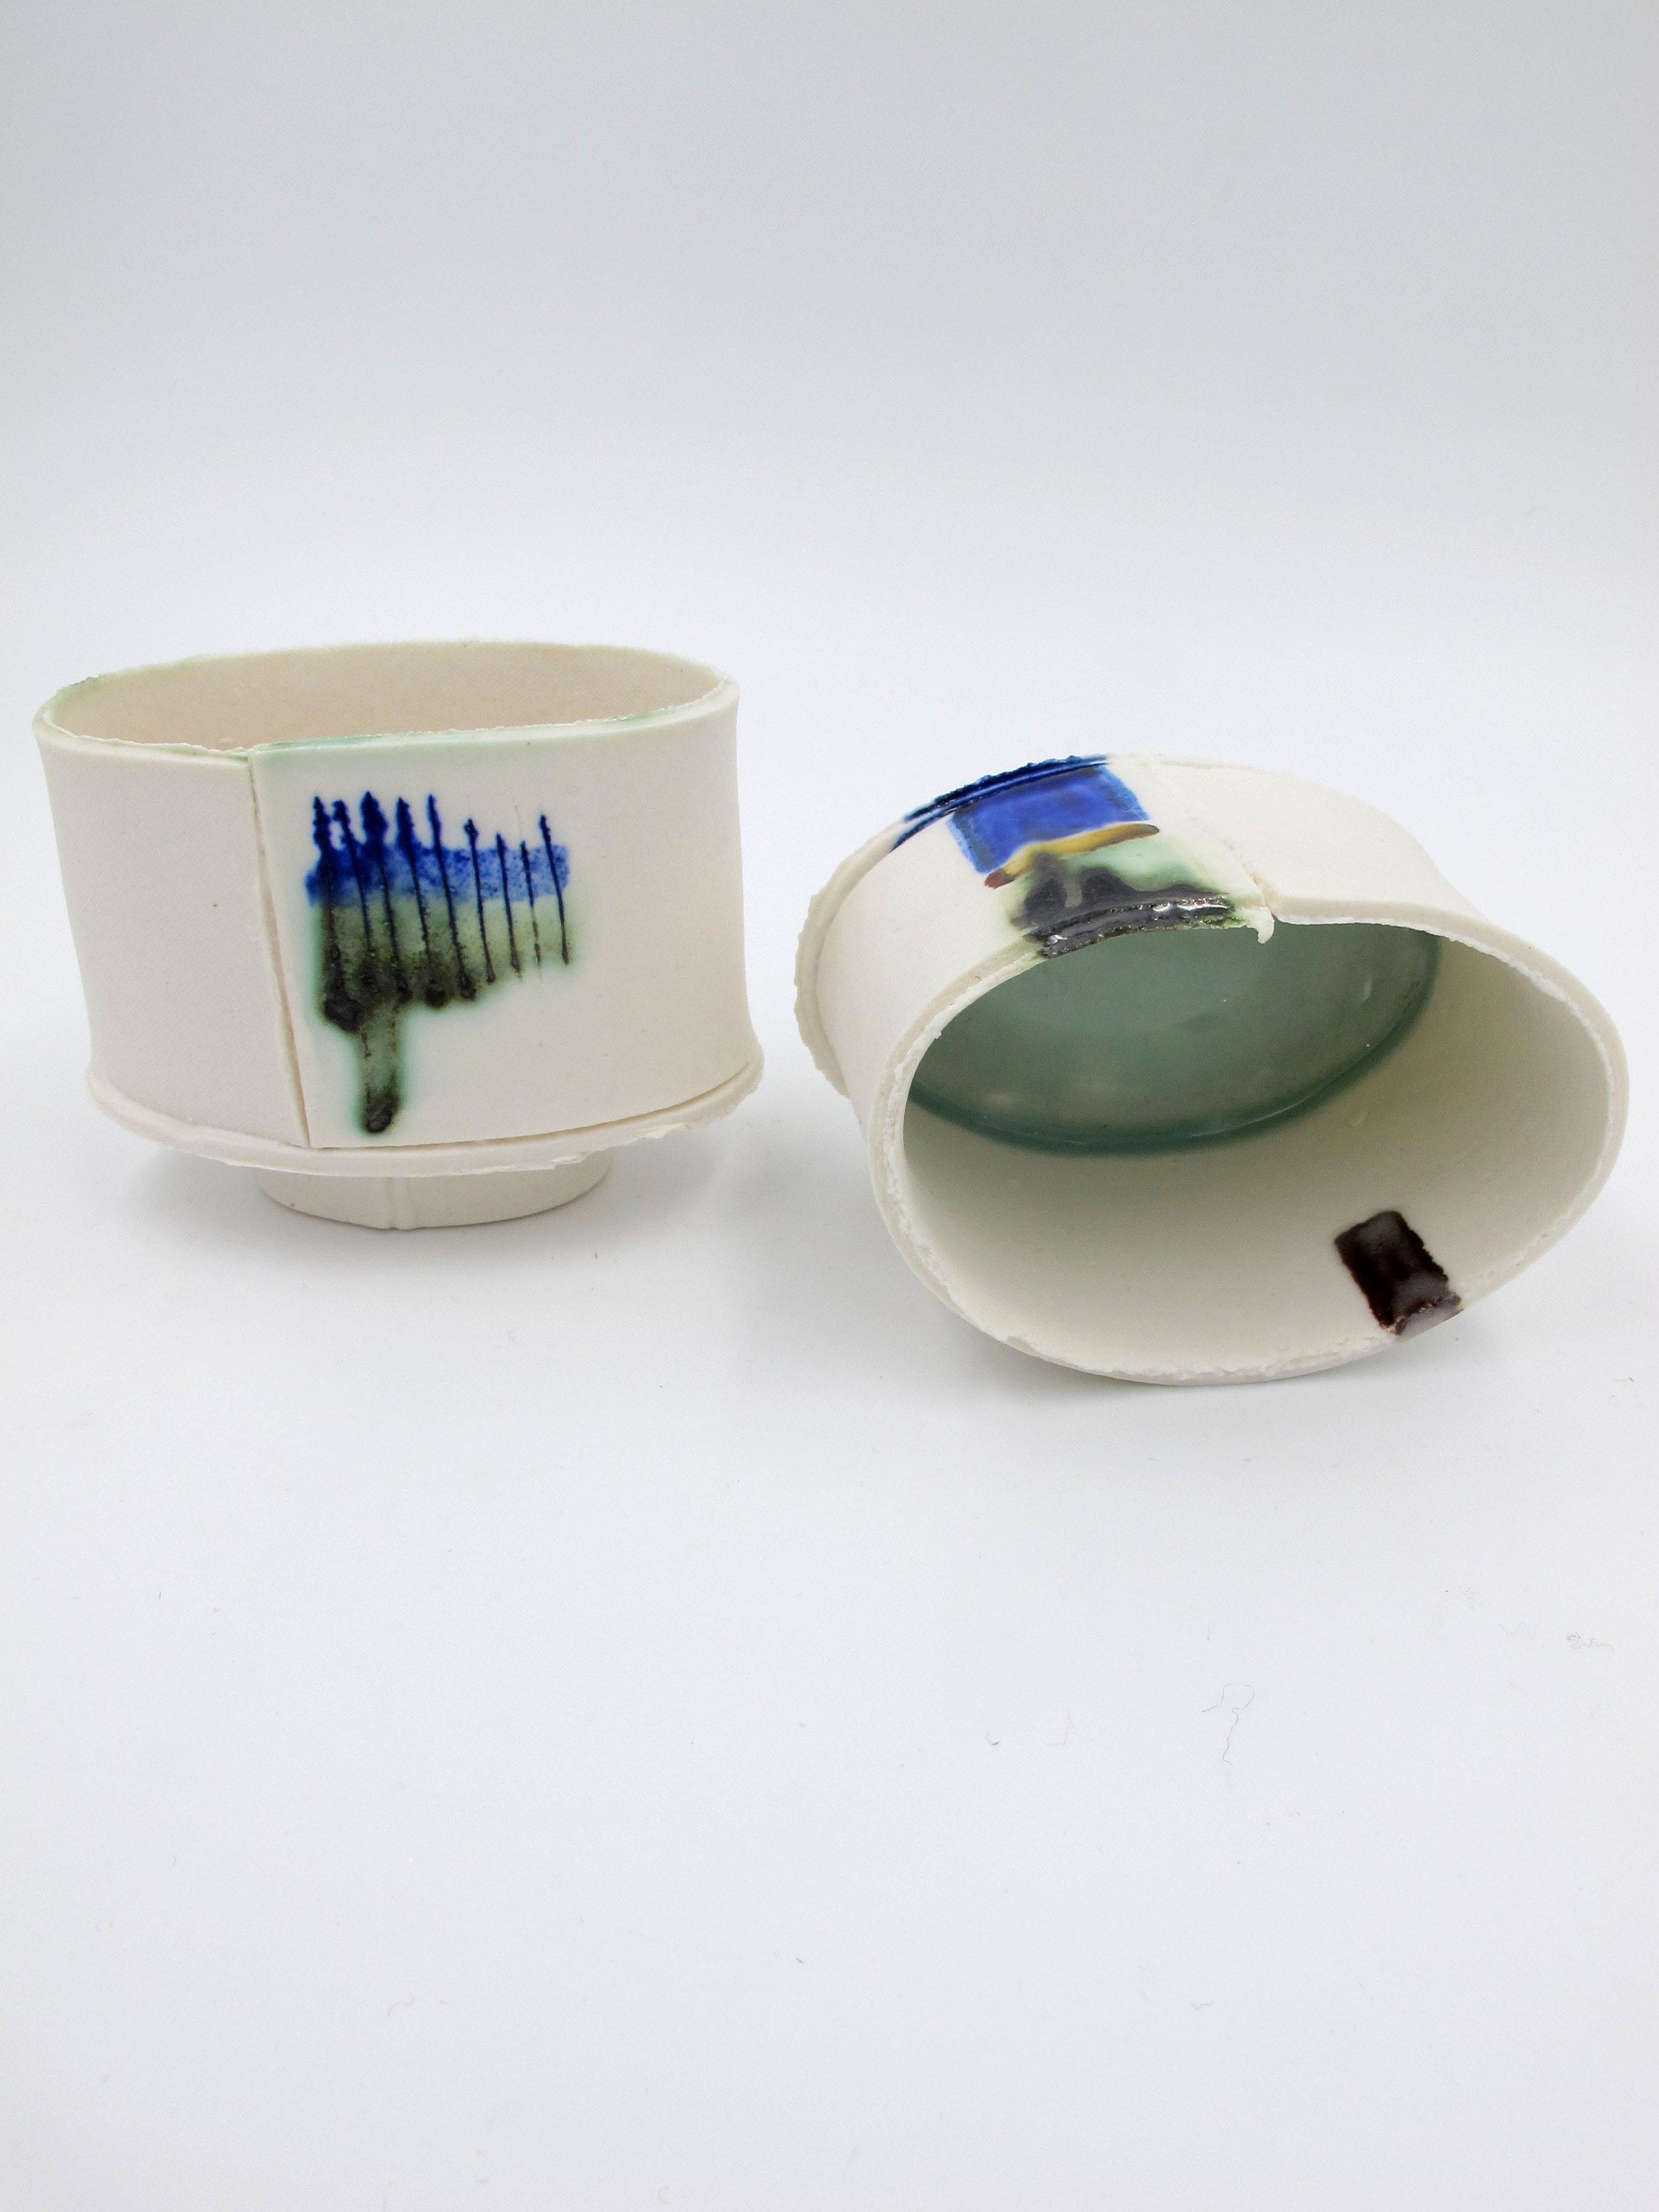 Porcelain tea vessels from Jane Prichard